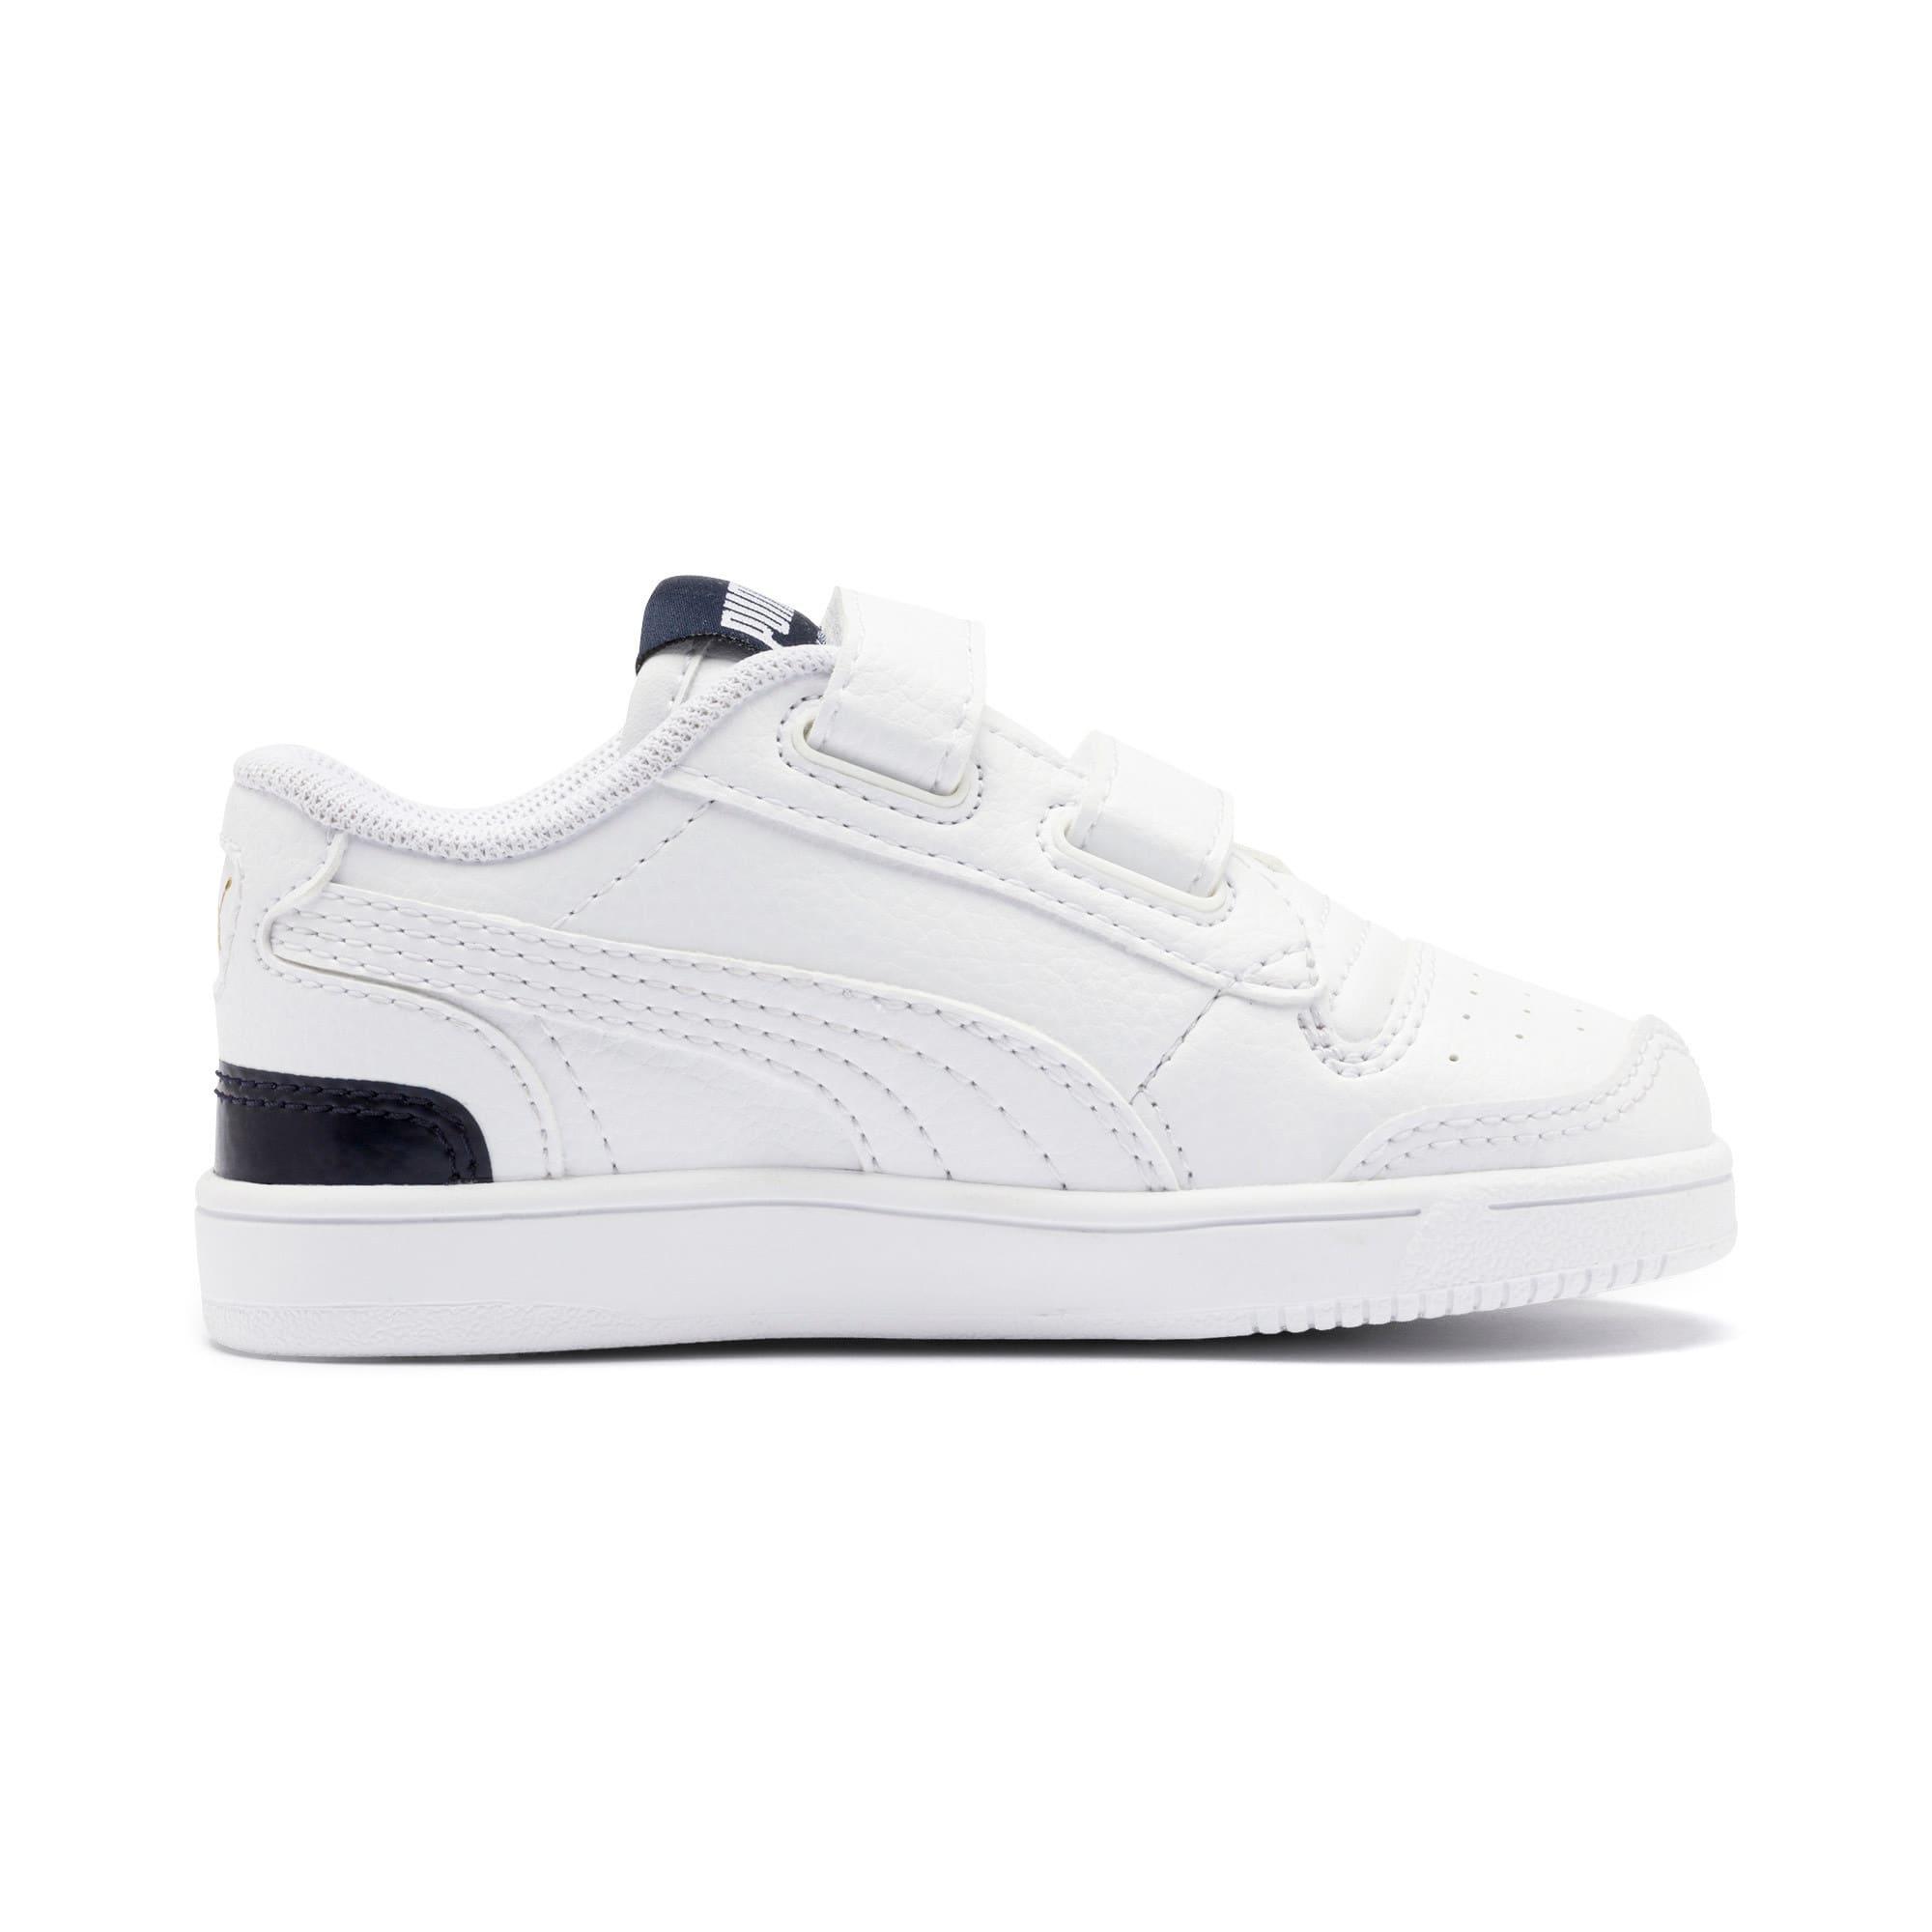 Thumbnail 5 of Ralph Sampson Low AC Toddler Shoes, White-Peacoat-White, medium